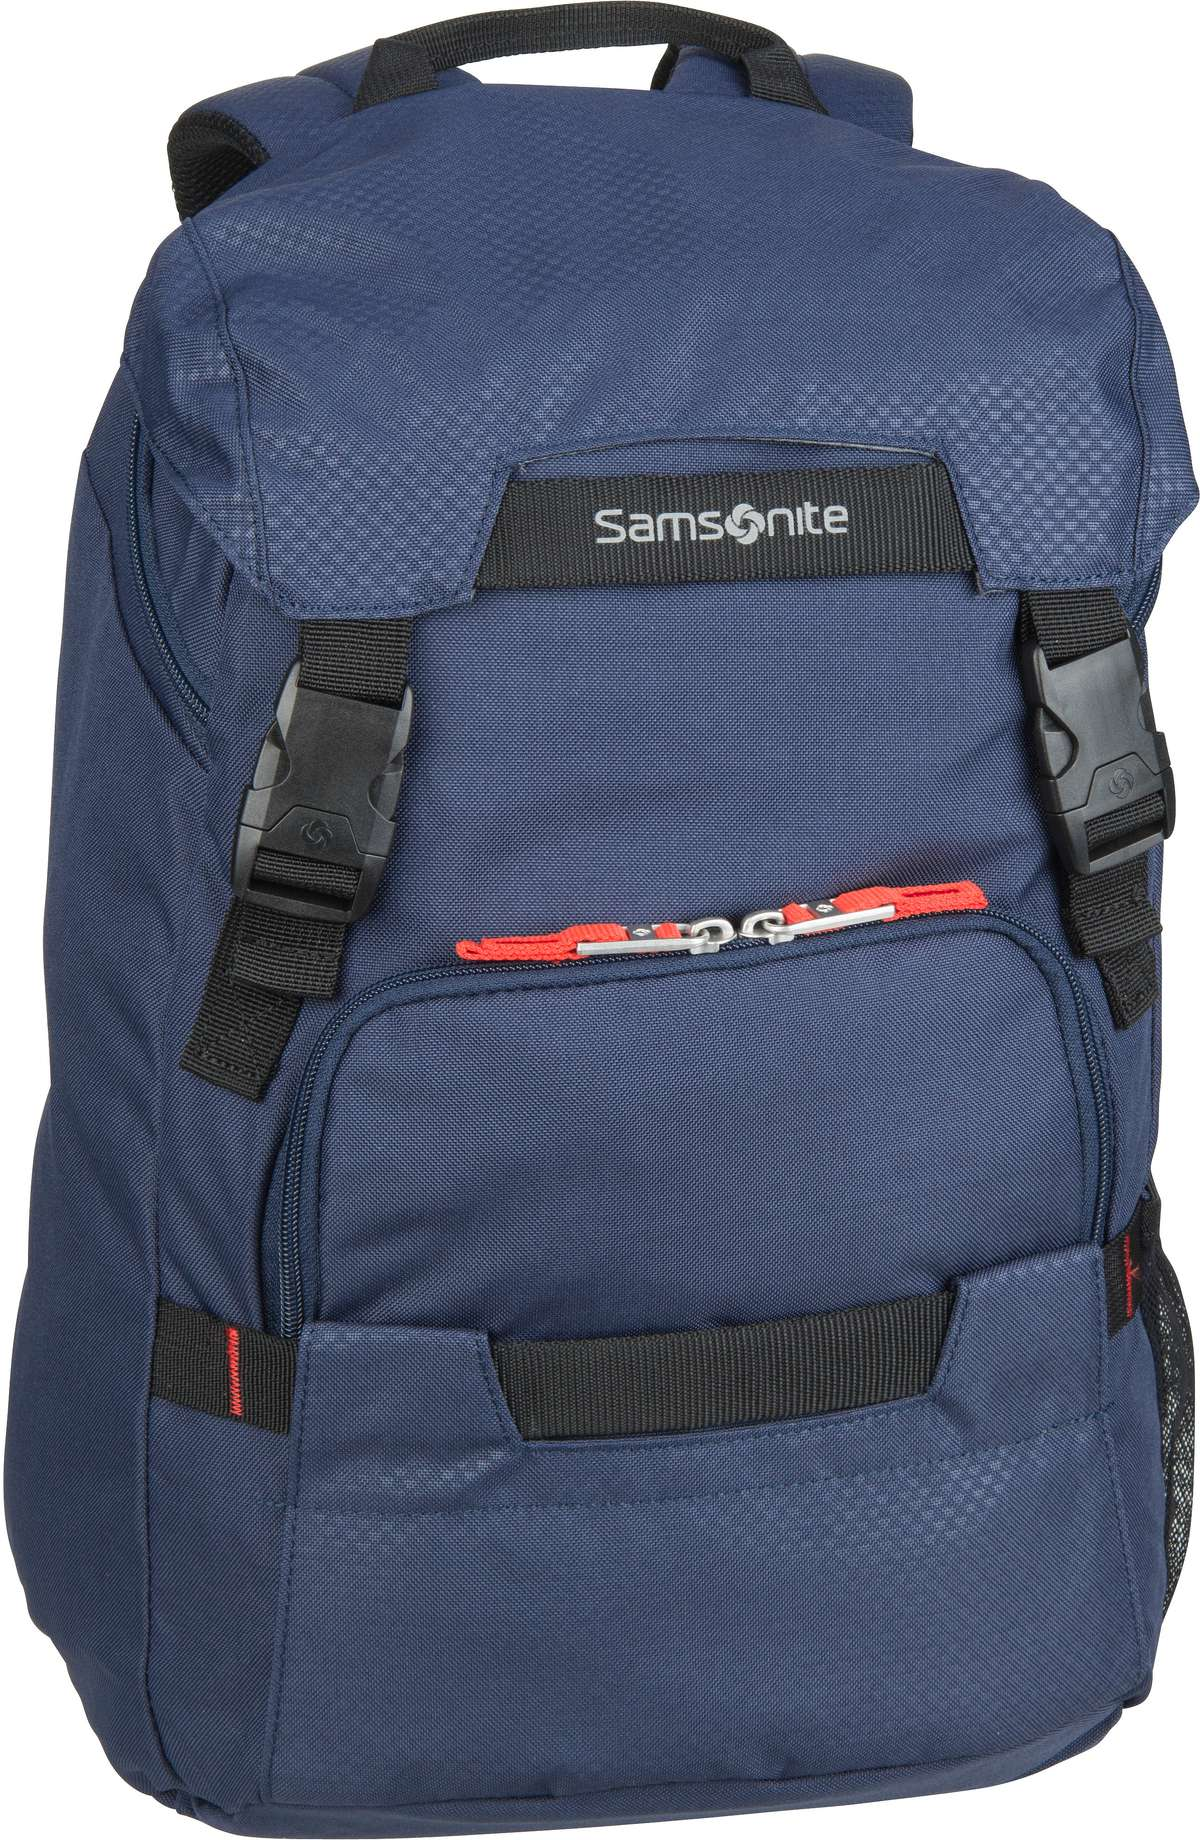 Rucksack / Daypack Sonora Laptop Backpack M Night Blue (23 Liter)